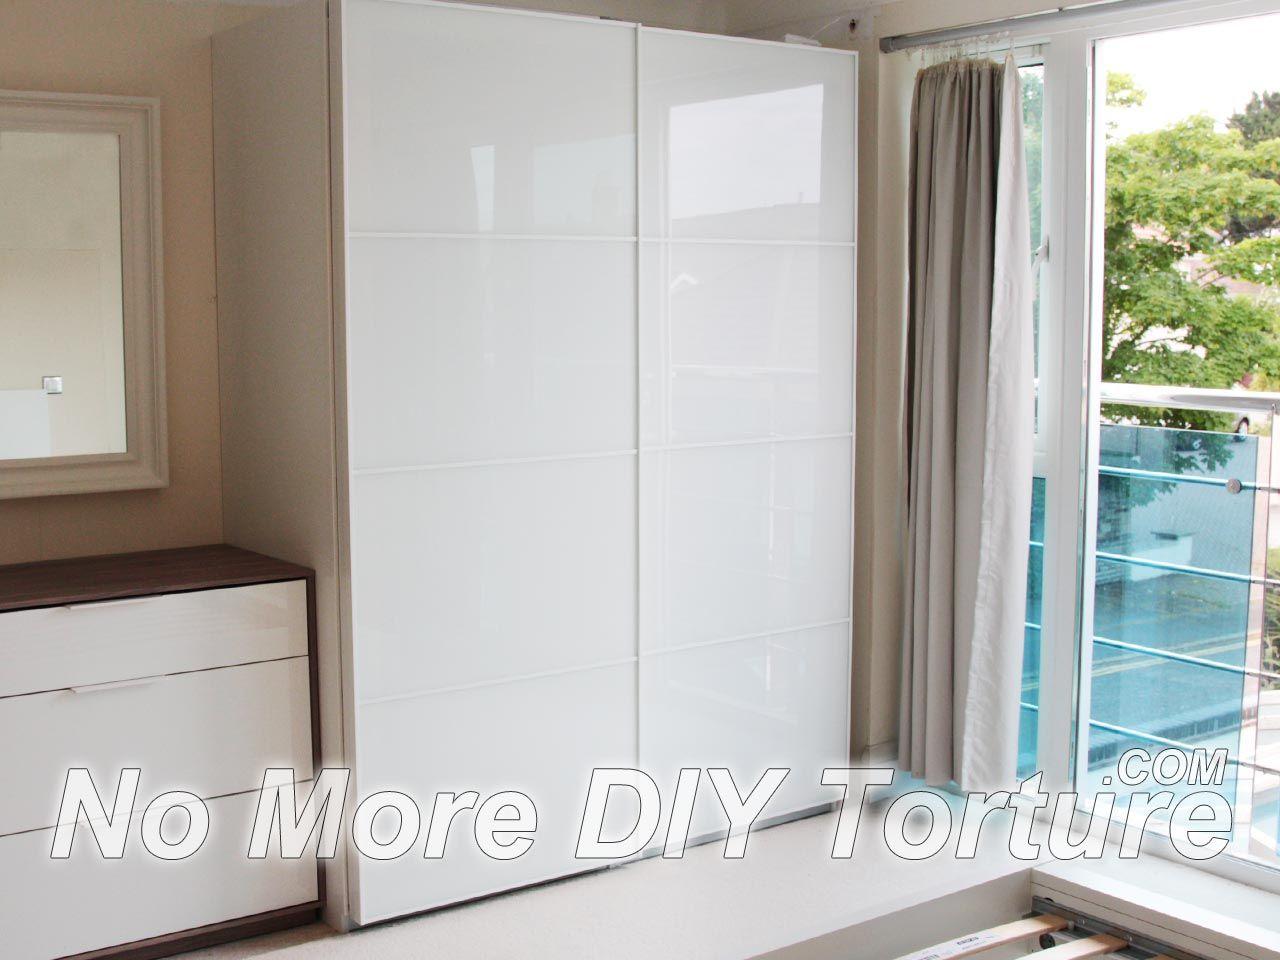 ikea pax farvik white glass door wardrobe deco bedroom pinterest wardrobes ux ui designer. Black Bedroom Furniture Sets. Home Design Ideas